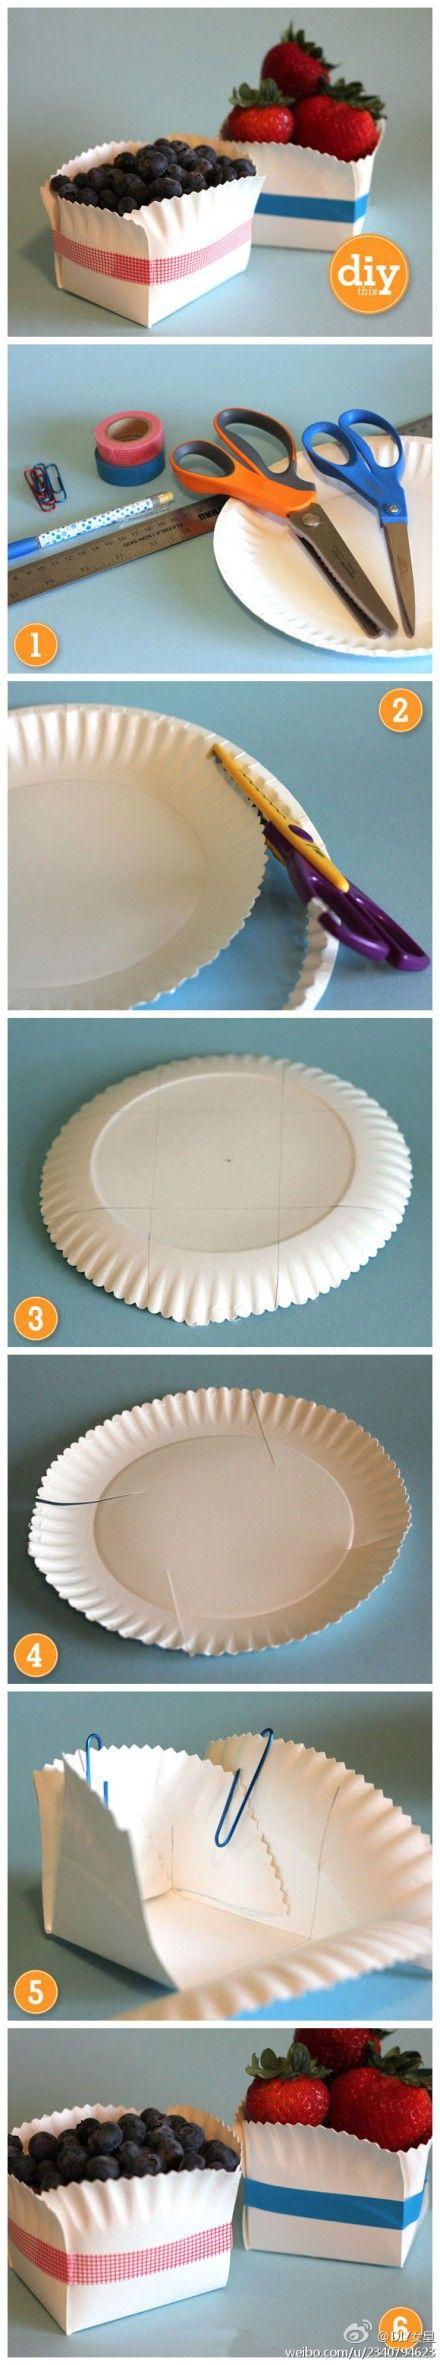 DIY: leuke (fruit)mandjes maken - Culy.nl